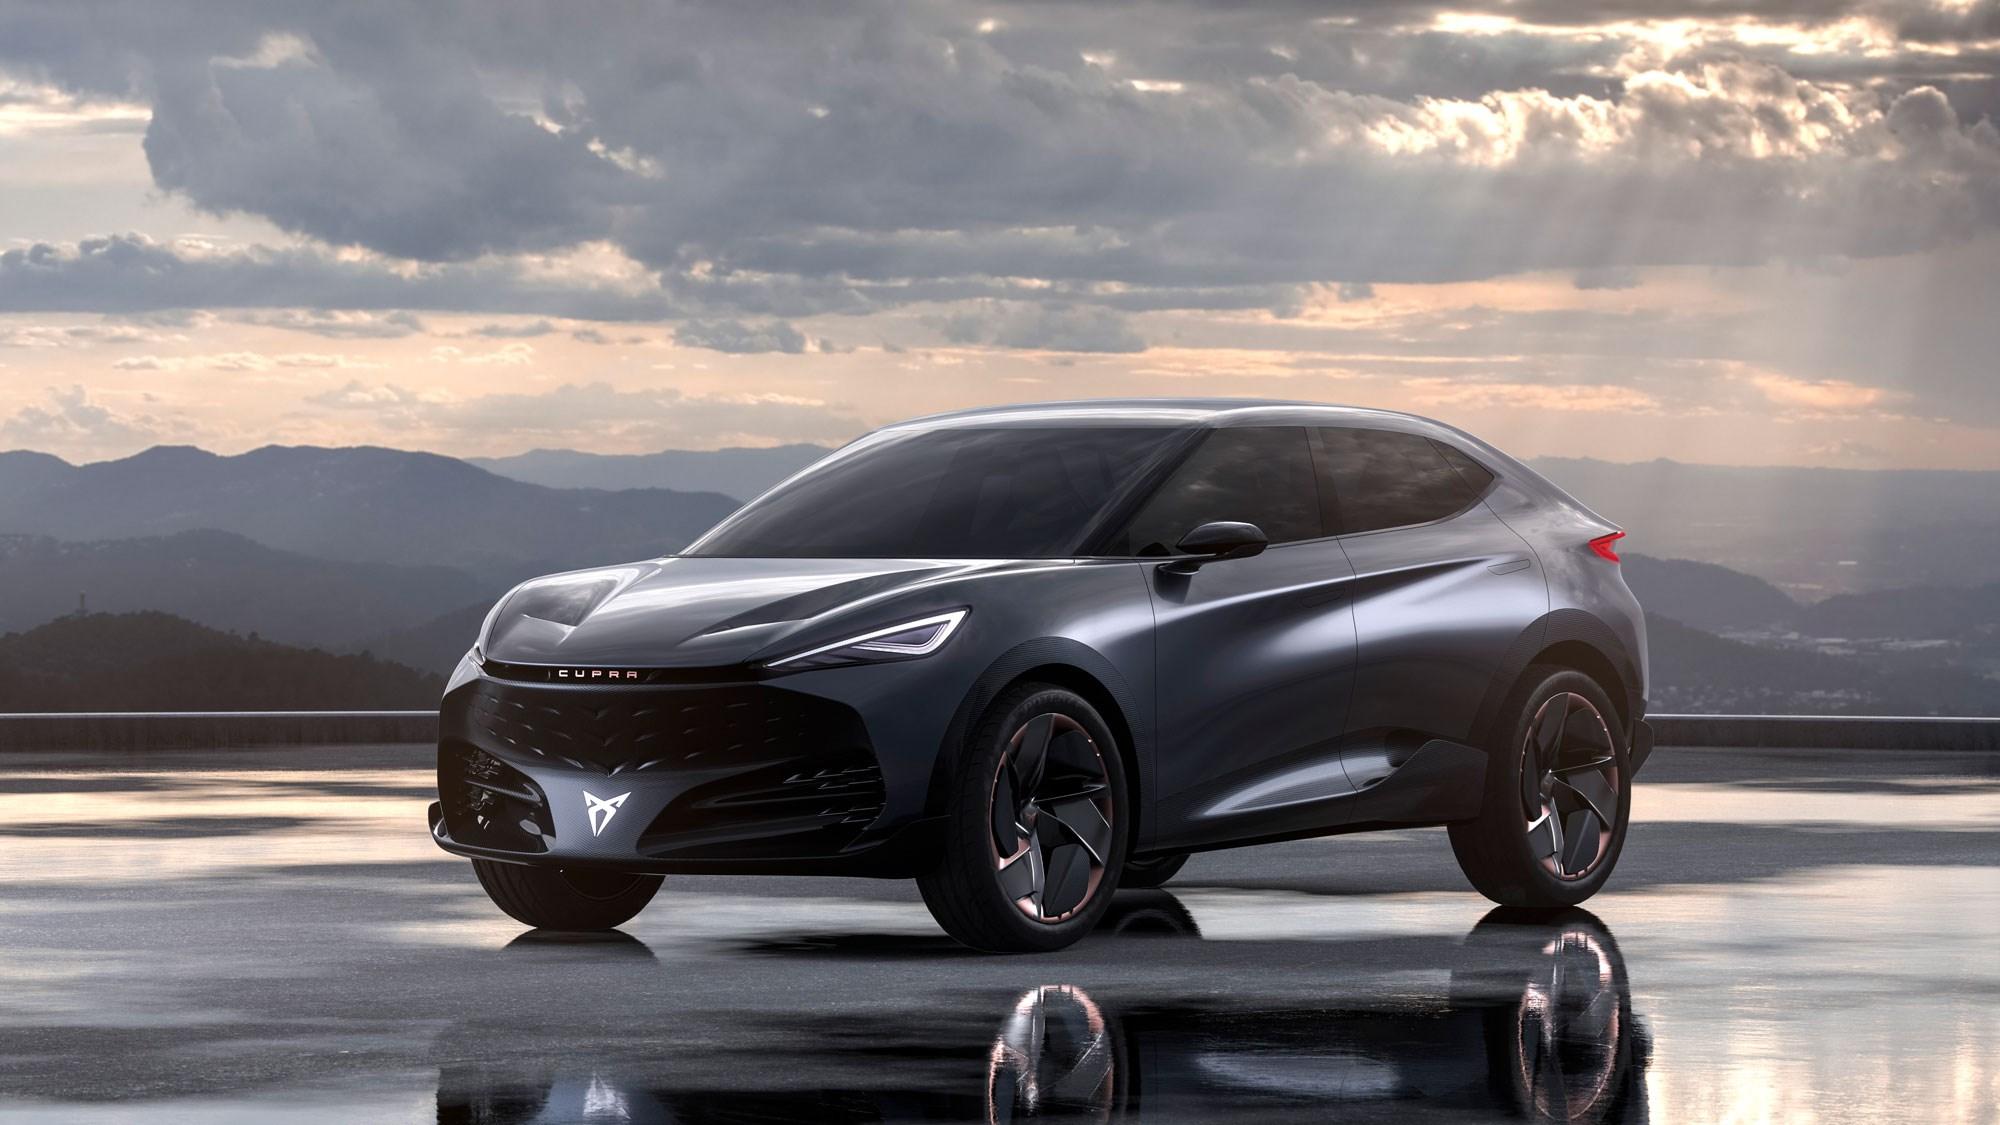 Cupra Tavascan: all-electric SUV concept revealed | CAR Magazine